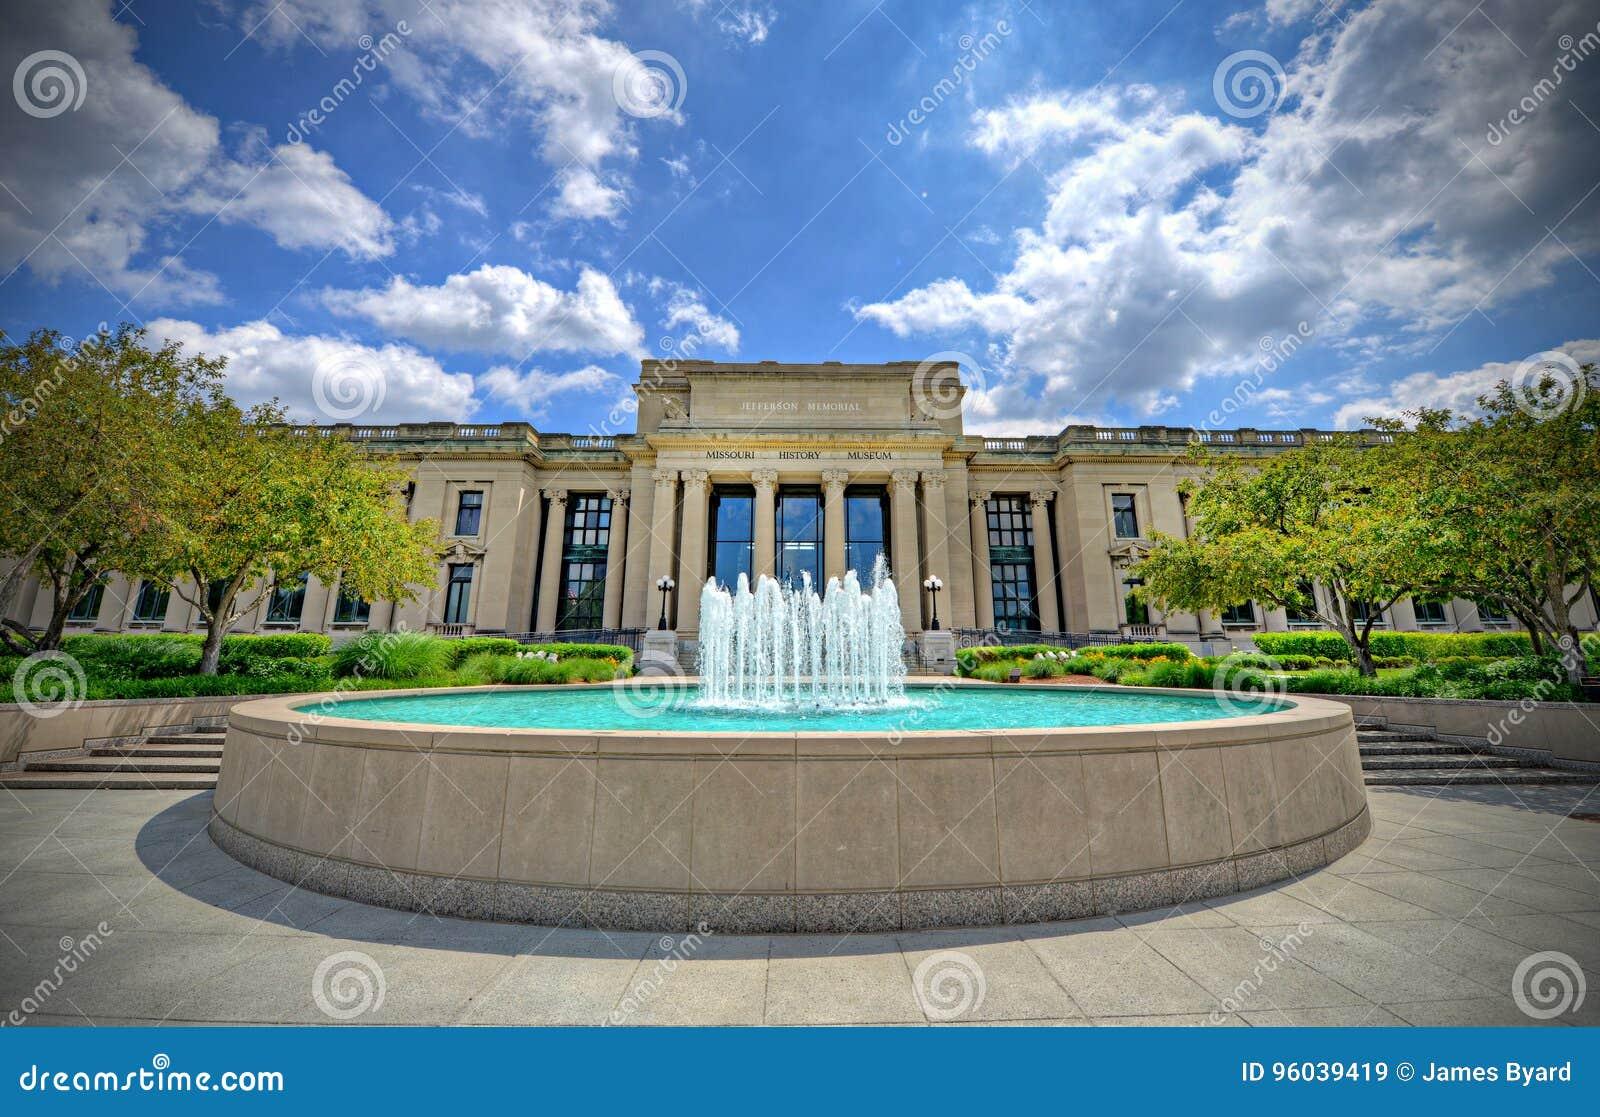 Missouri historii muzeum